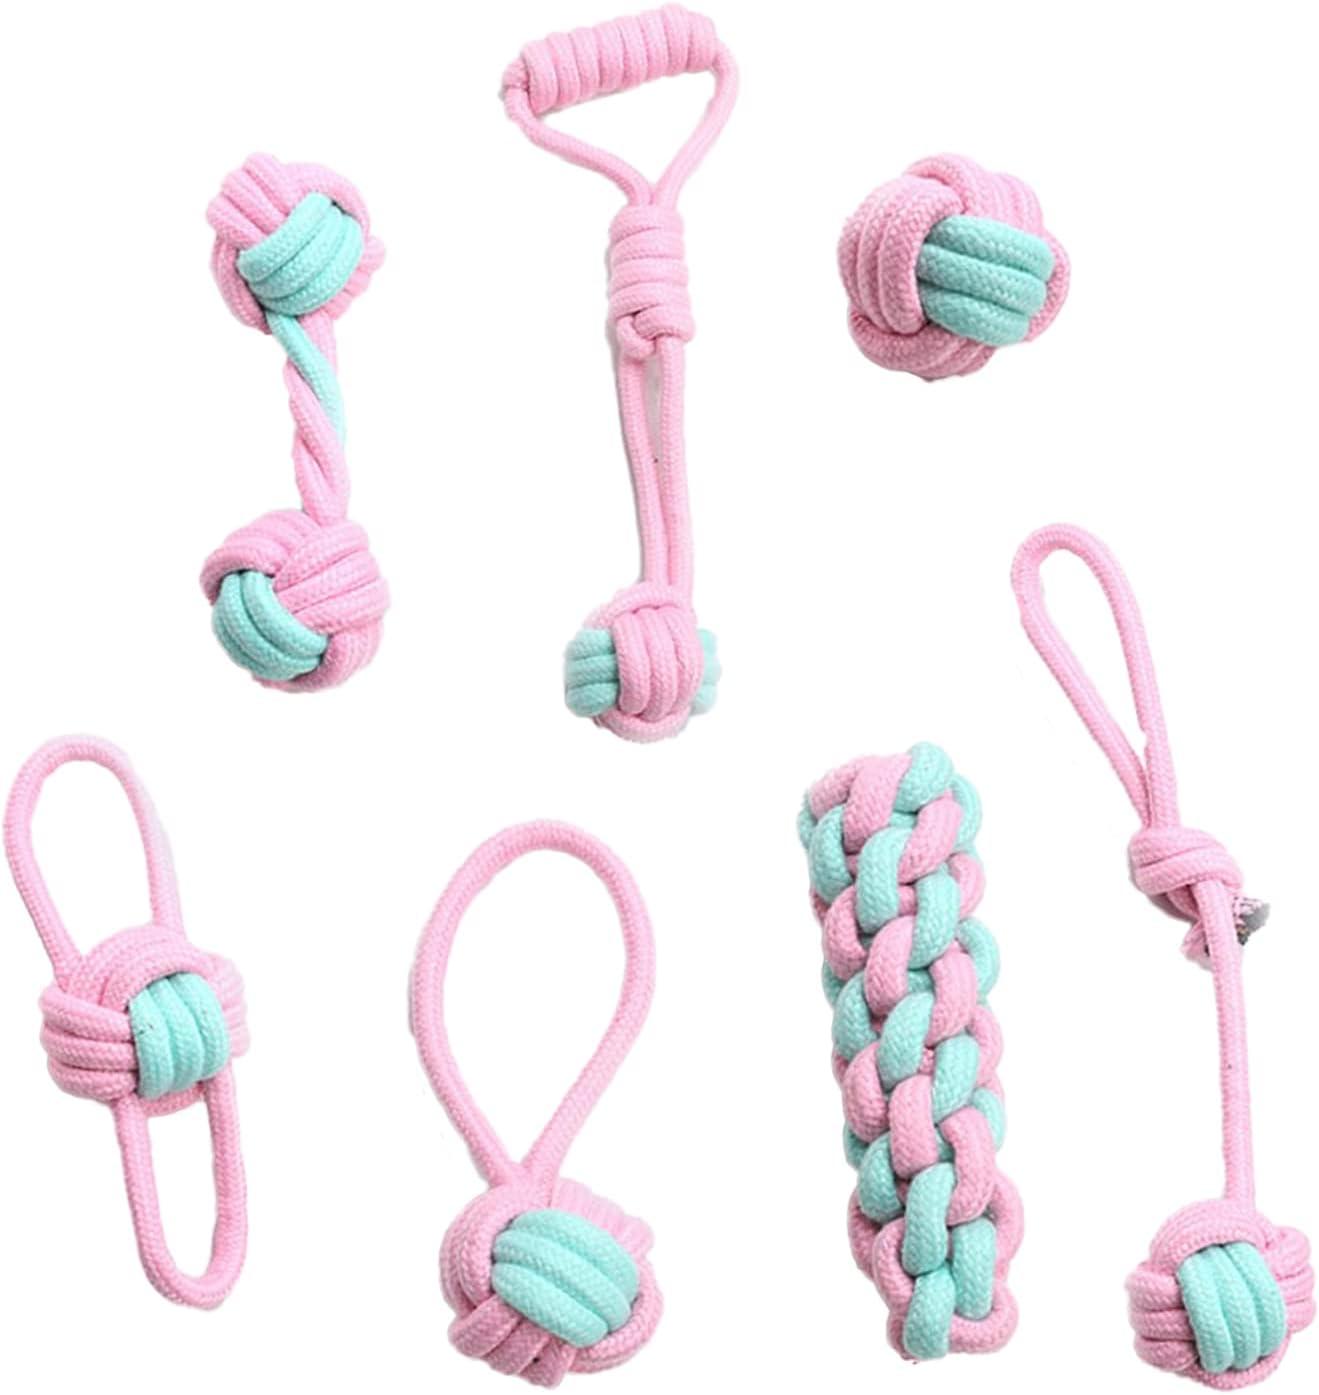 Japan's Popular popular largest assortment 7pcs Set Pet Dog Interactive Toy Cotton Woven Chewing Puppy